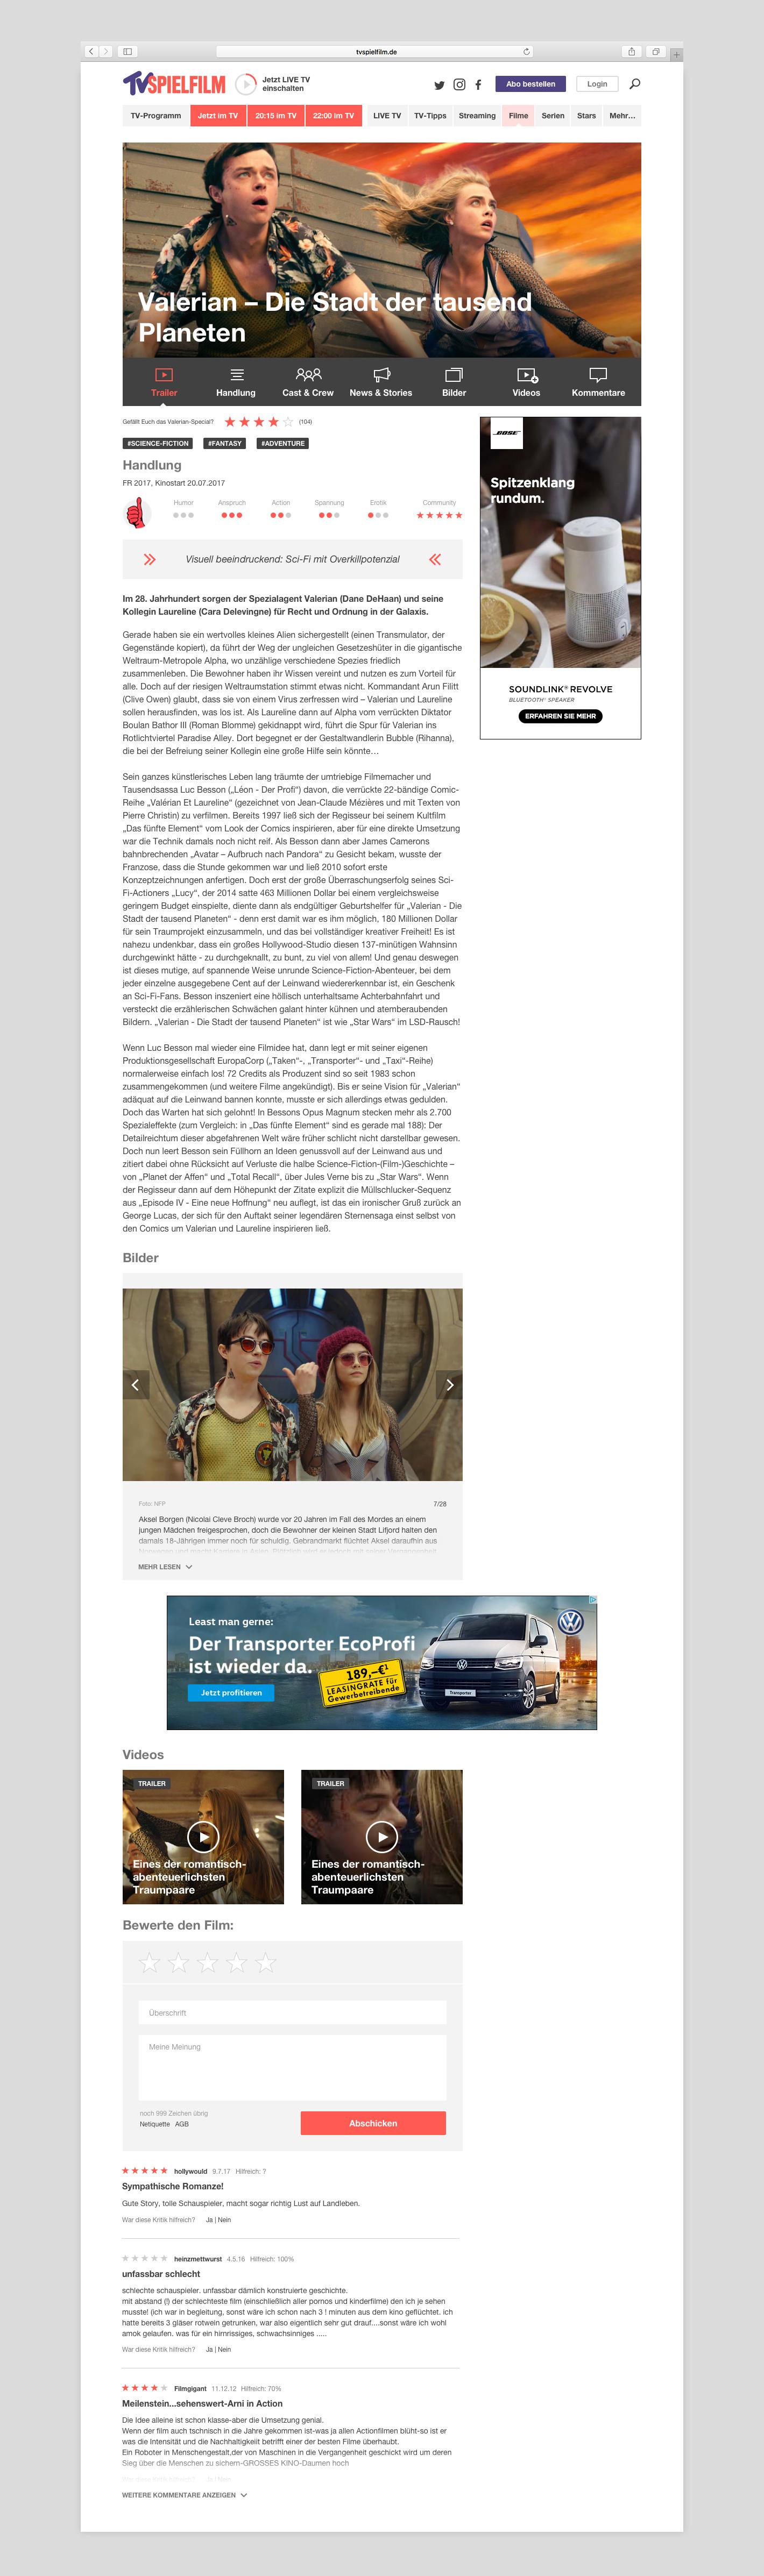 TVS-Filmkritik-Portfolio